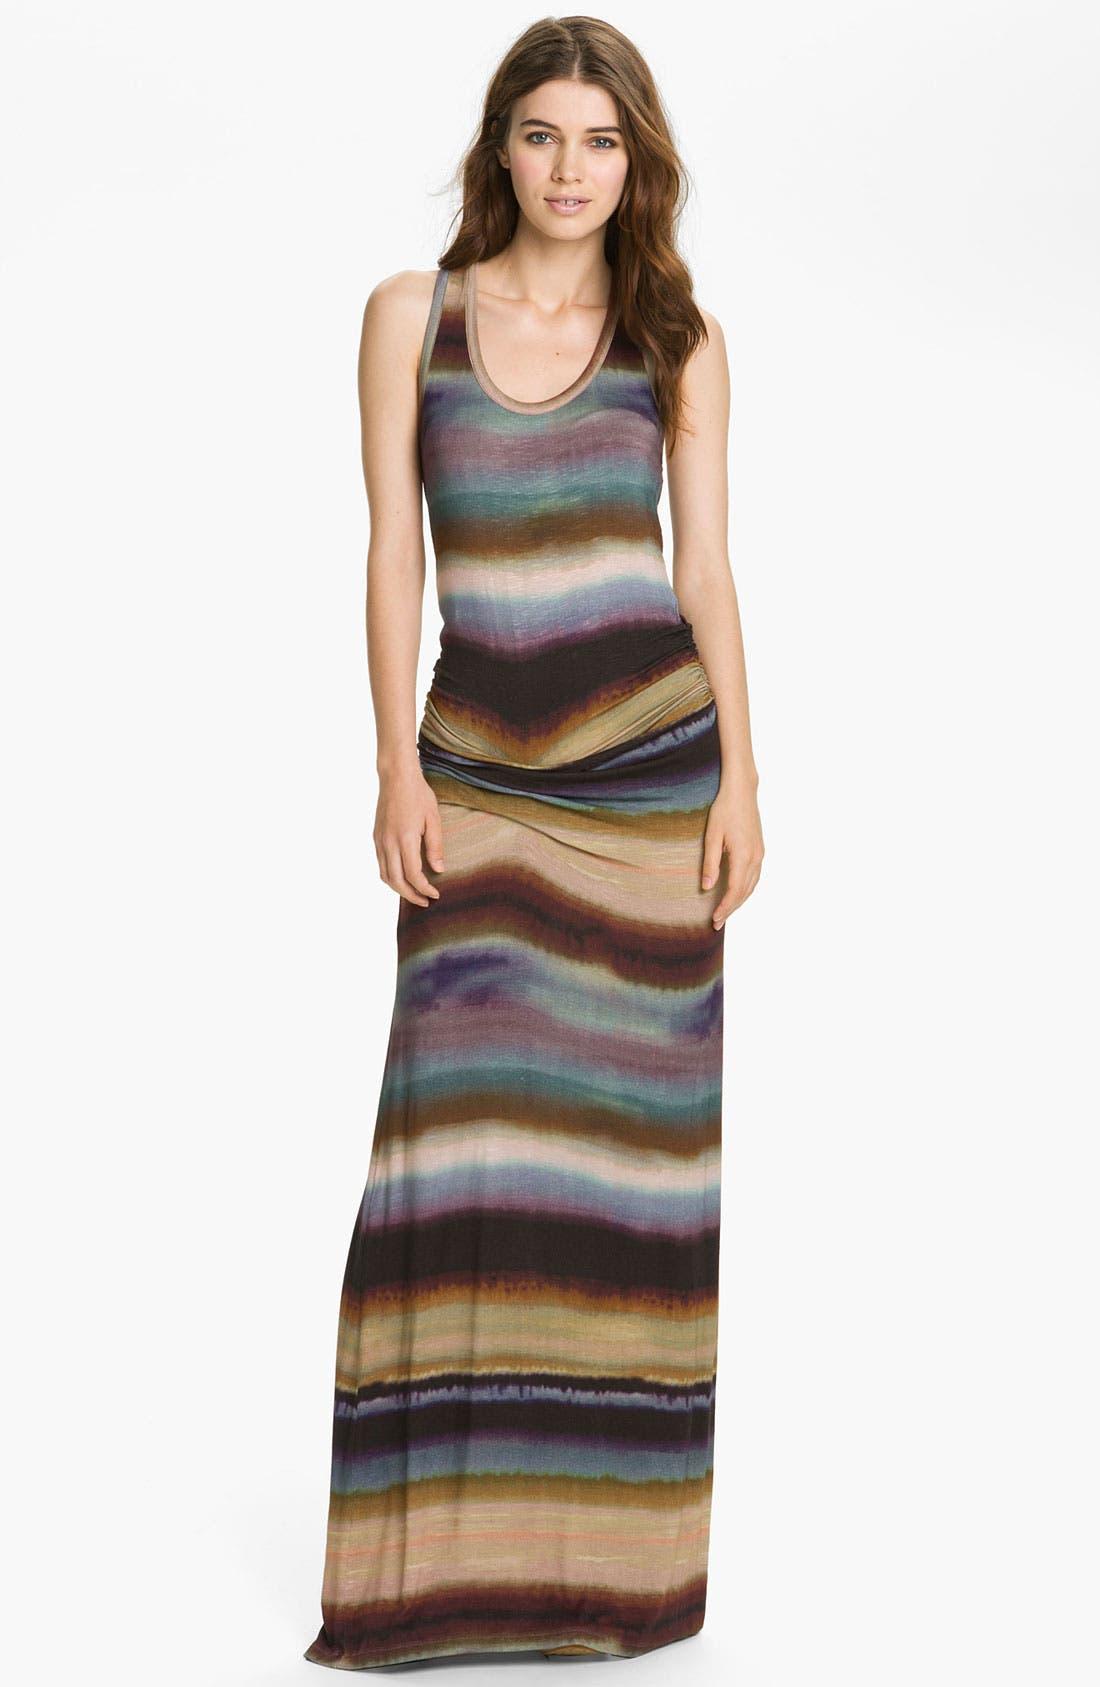 Main Image - Young, Fabulous & Broke 'Hamptons' Tie Dyed Stripe Maxi Dress